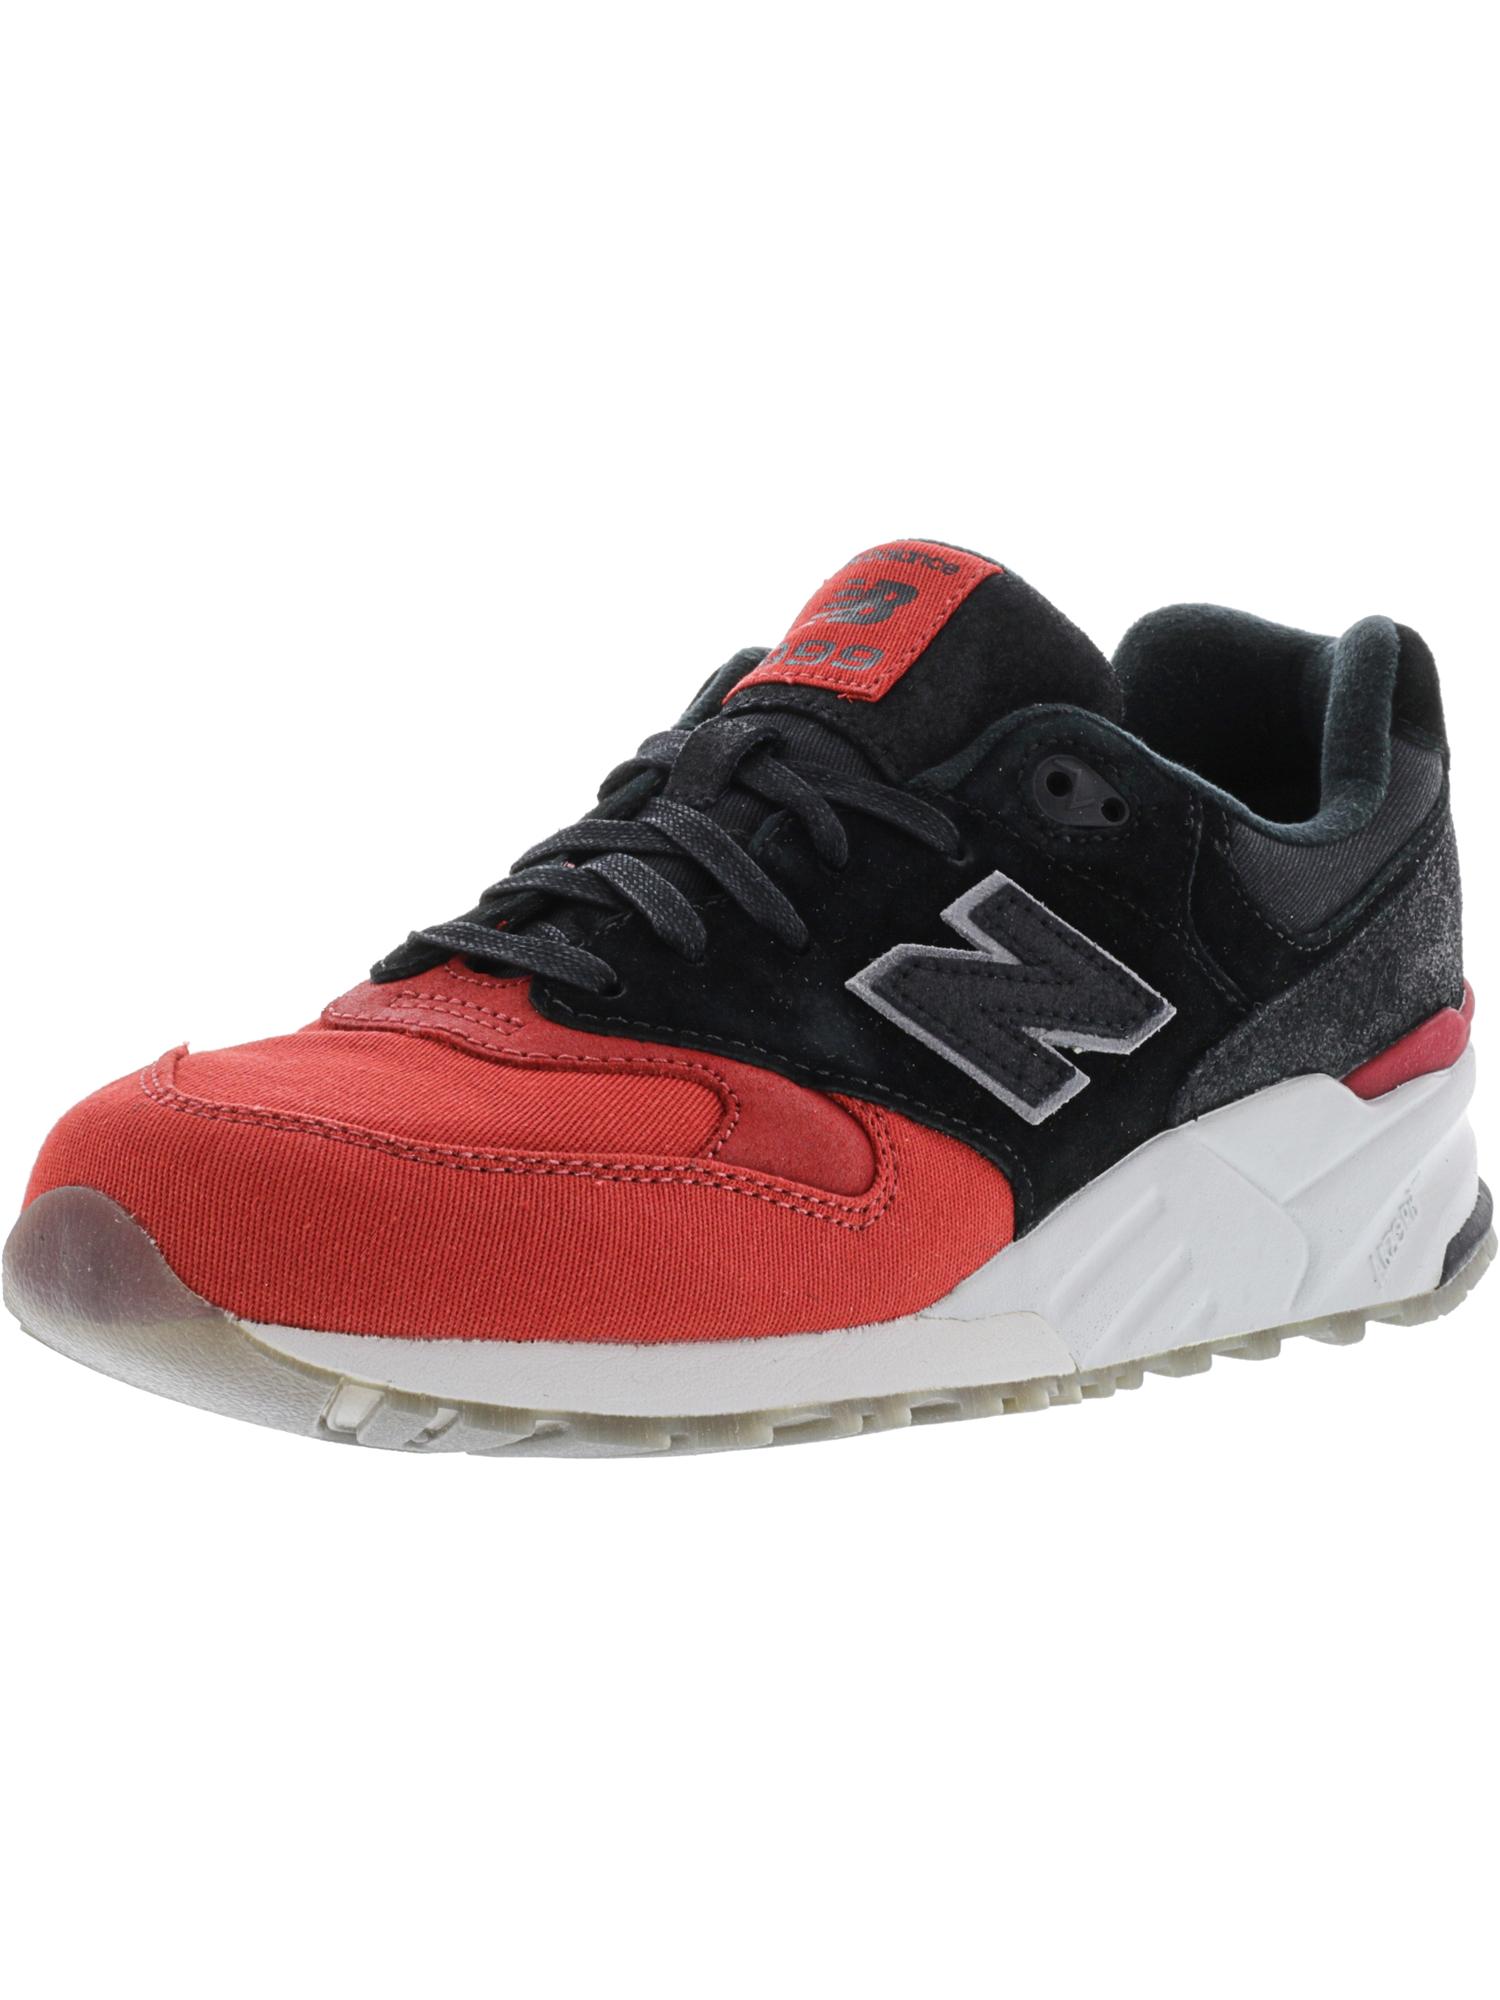 New Balance Men's Ml999 Wxb Ankle-High Canvas Running Shoe 9M by New Balance